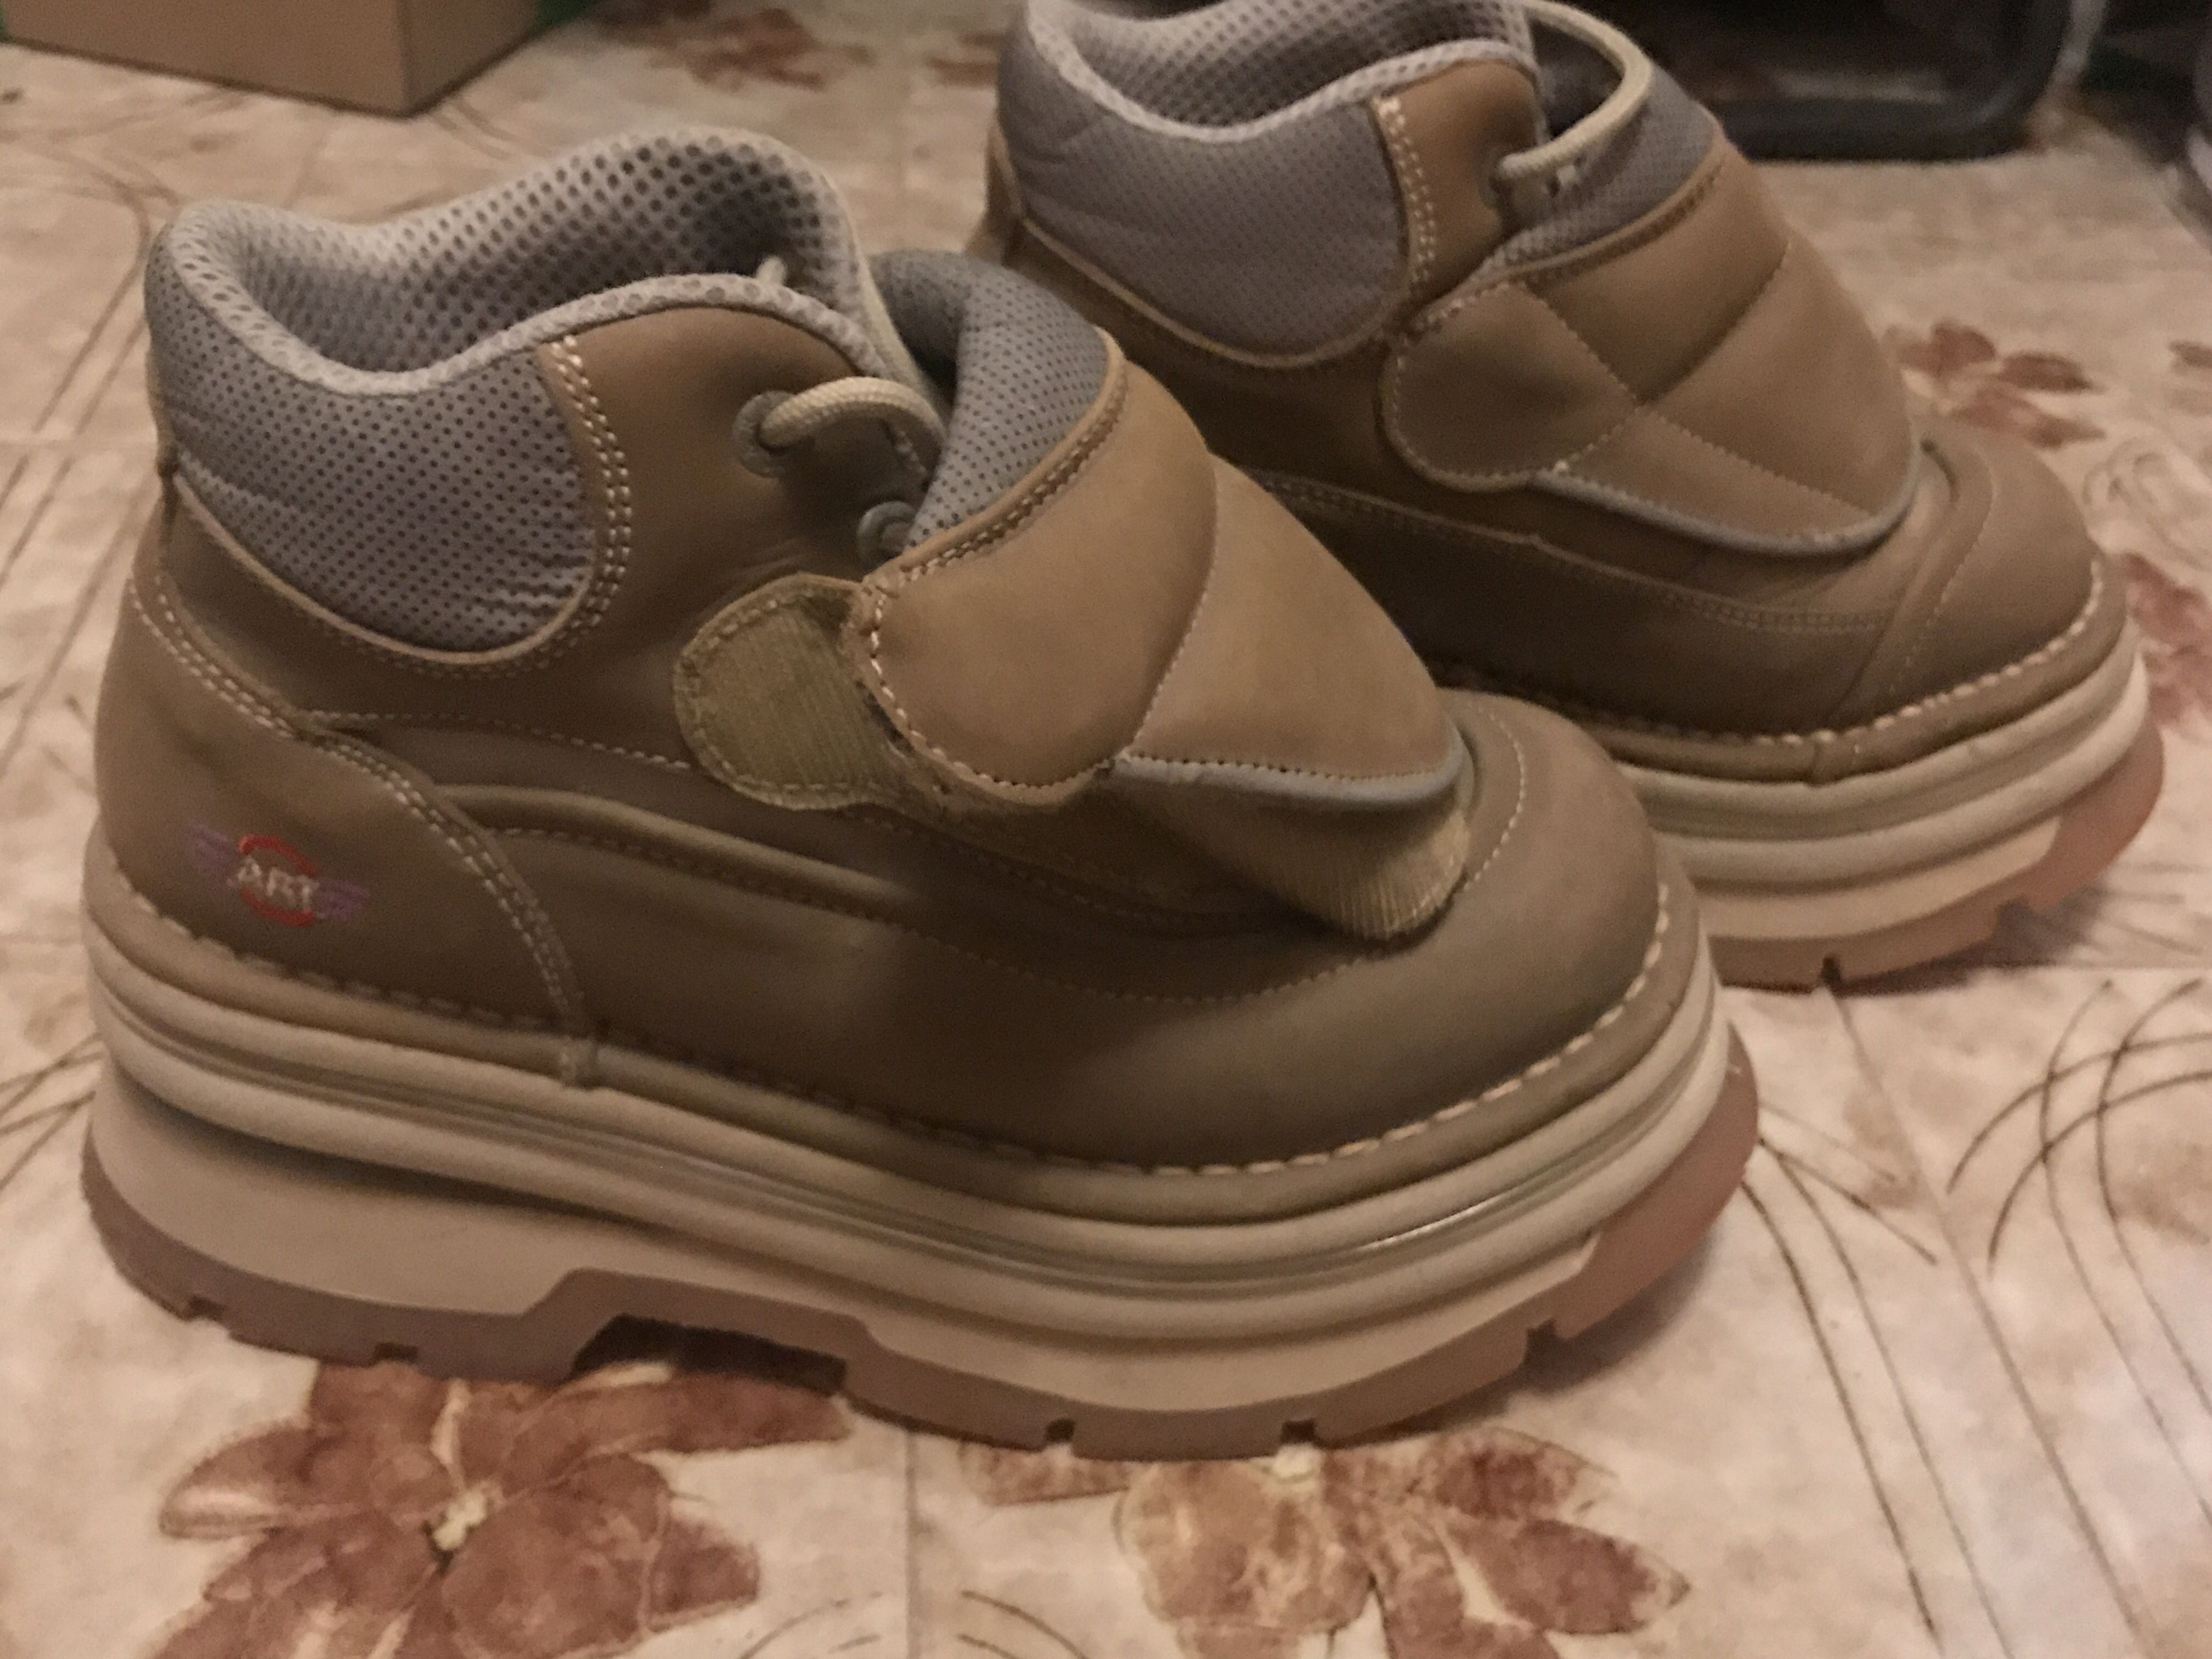 a9717f98e79 Alternative Platform Swear Shoes Boots by ArkhamsEmporium on Etsy ...